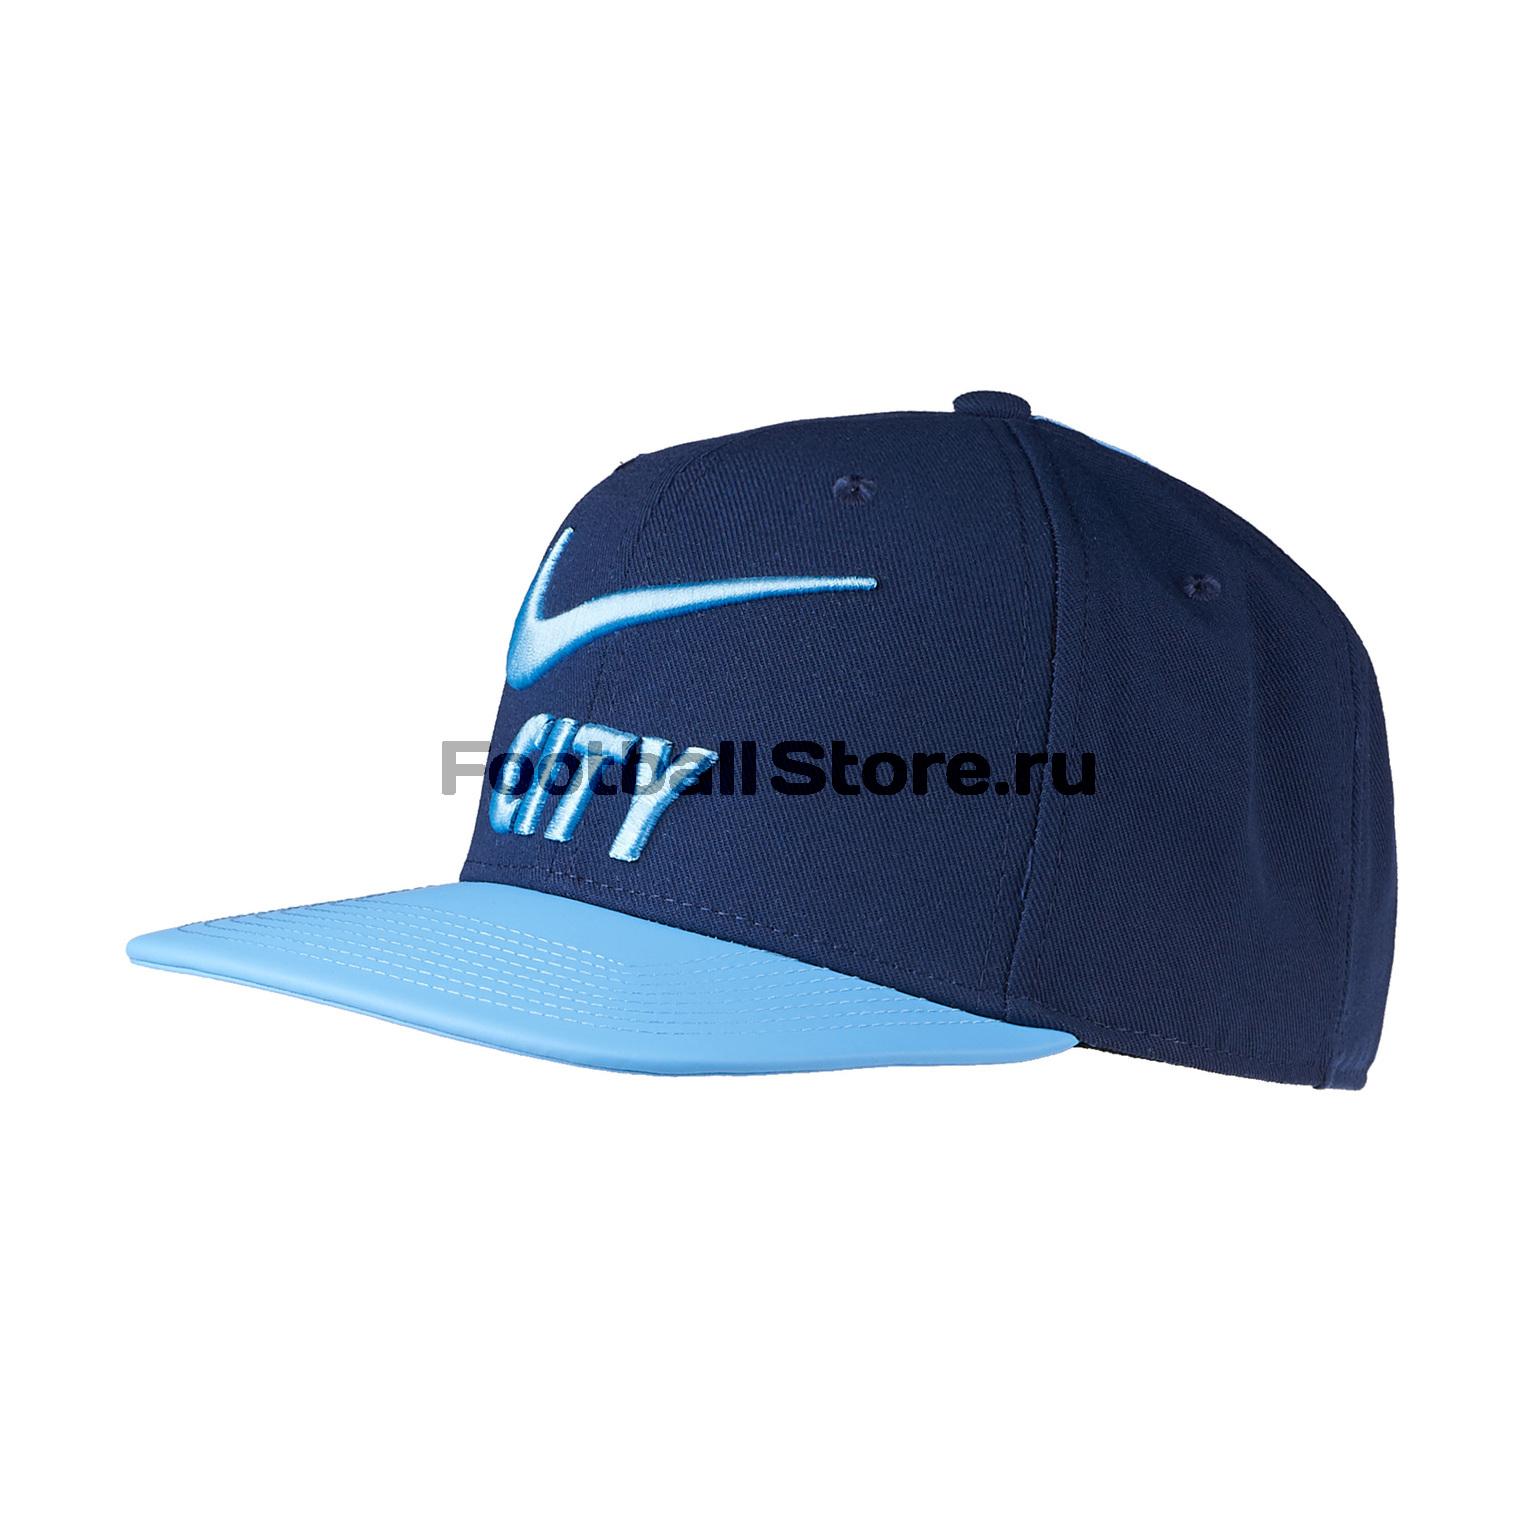 Бейсболка Nike Manchester City Pro Cap Pride 916578-410 футболка nike manchester city 898623 488